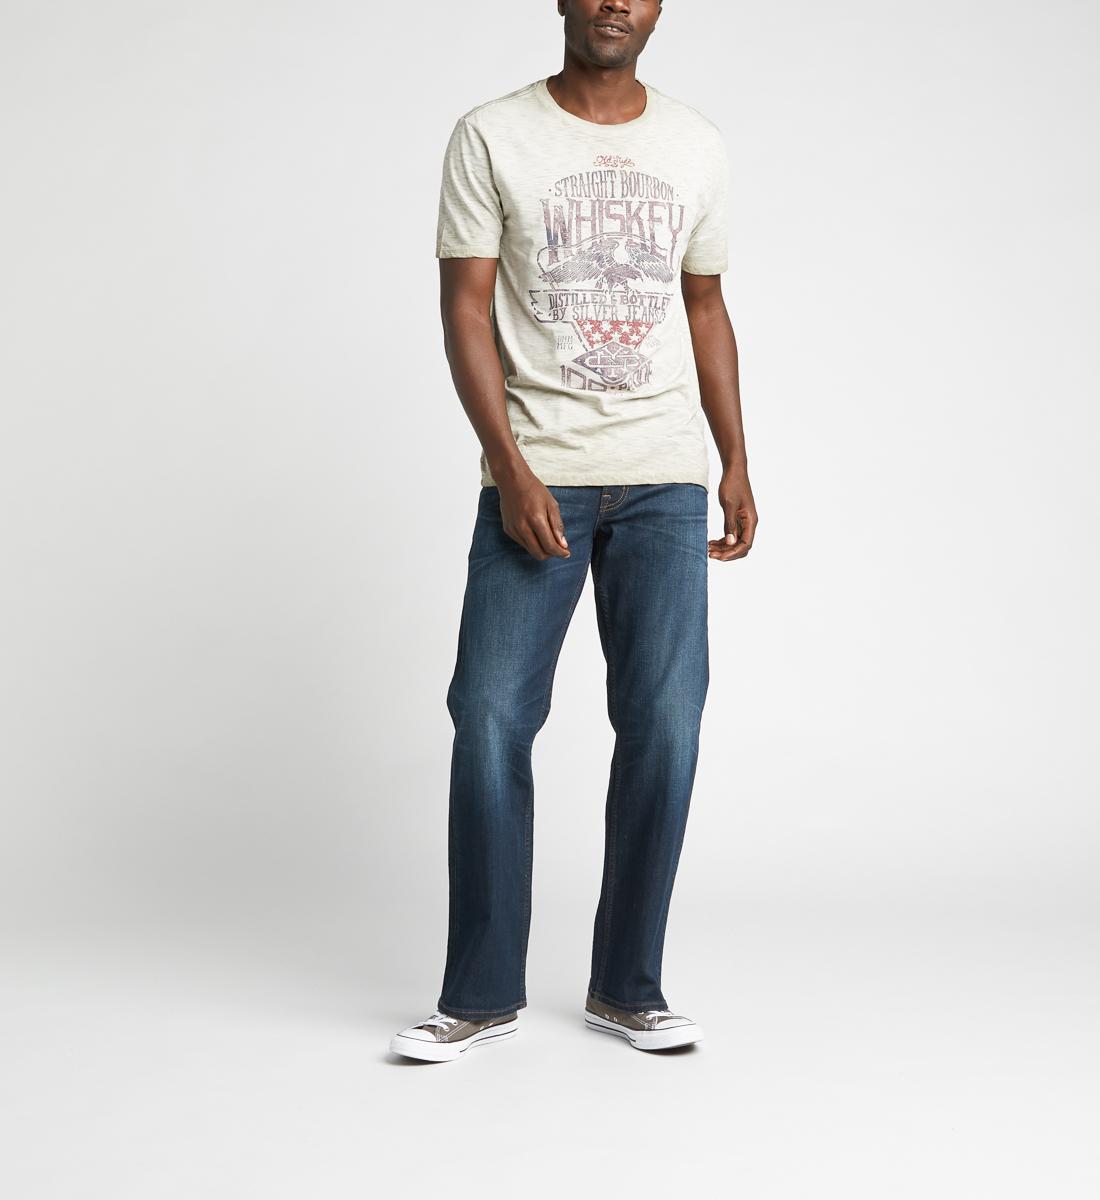 Silver Jeans Zac